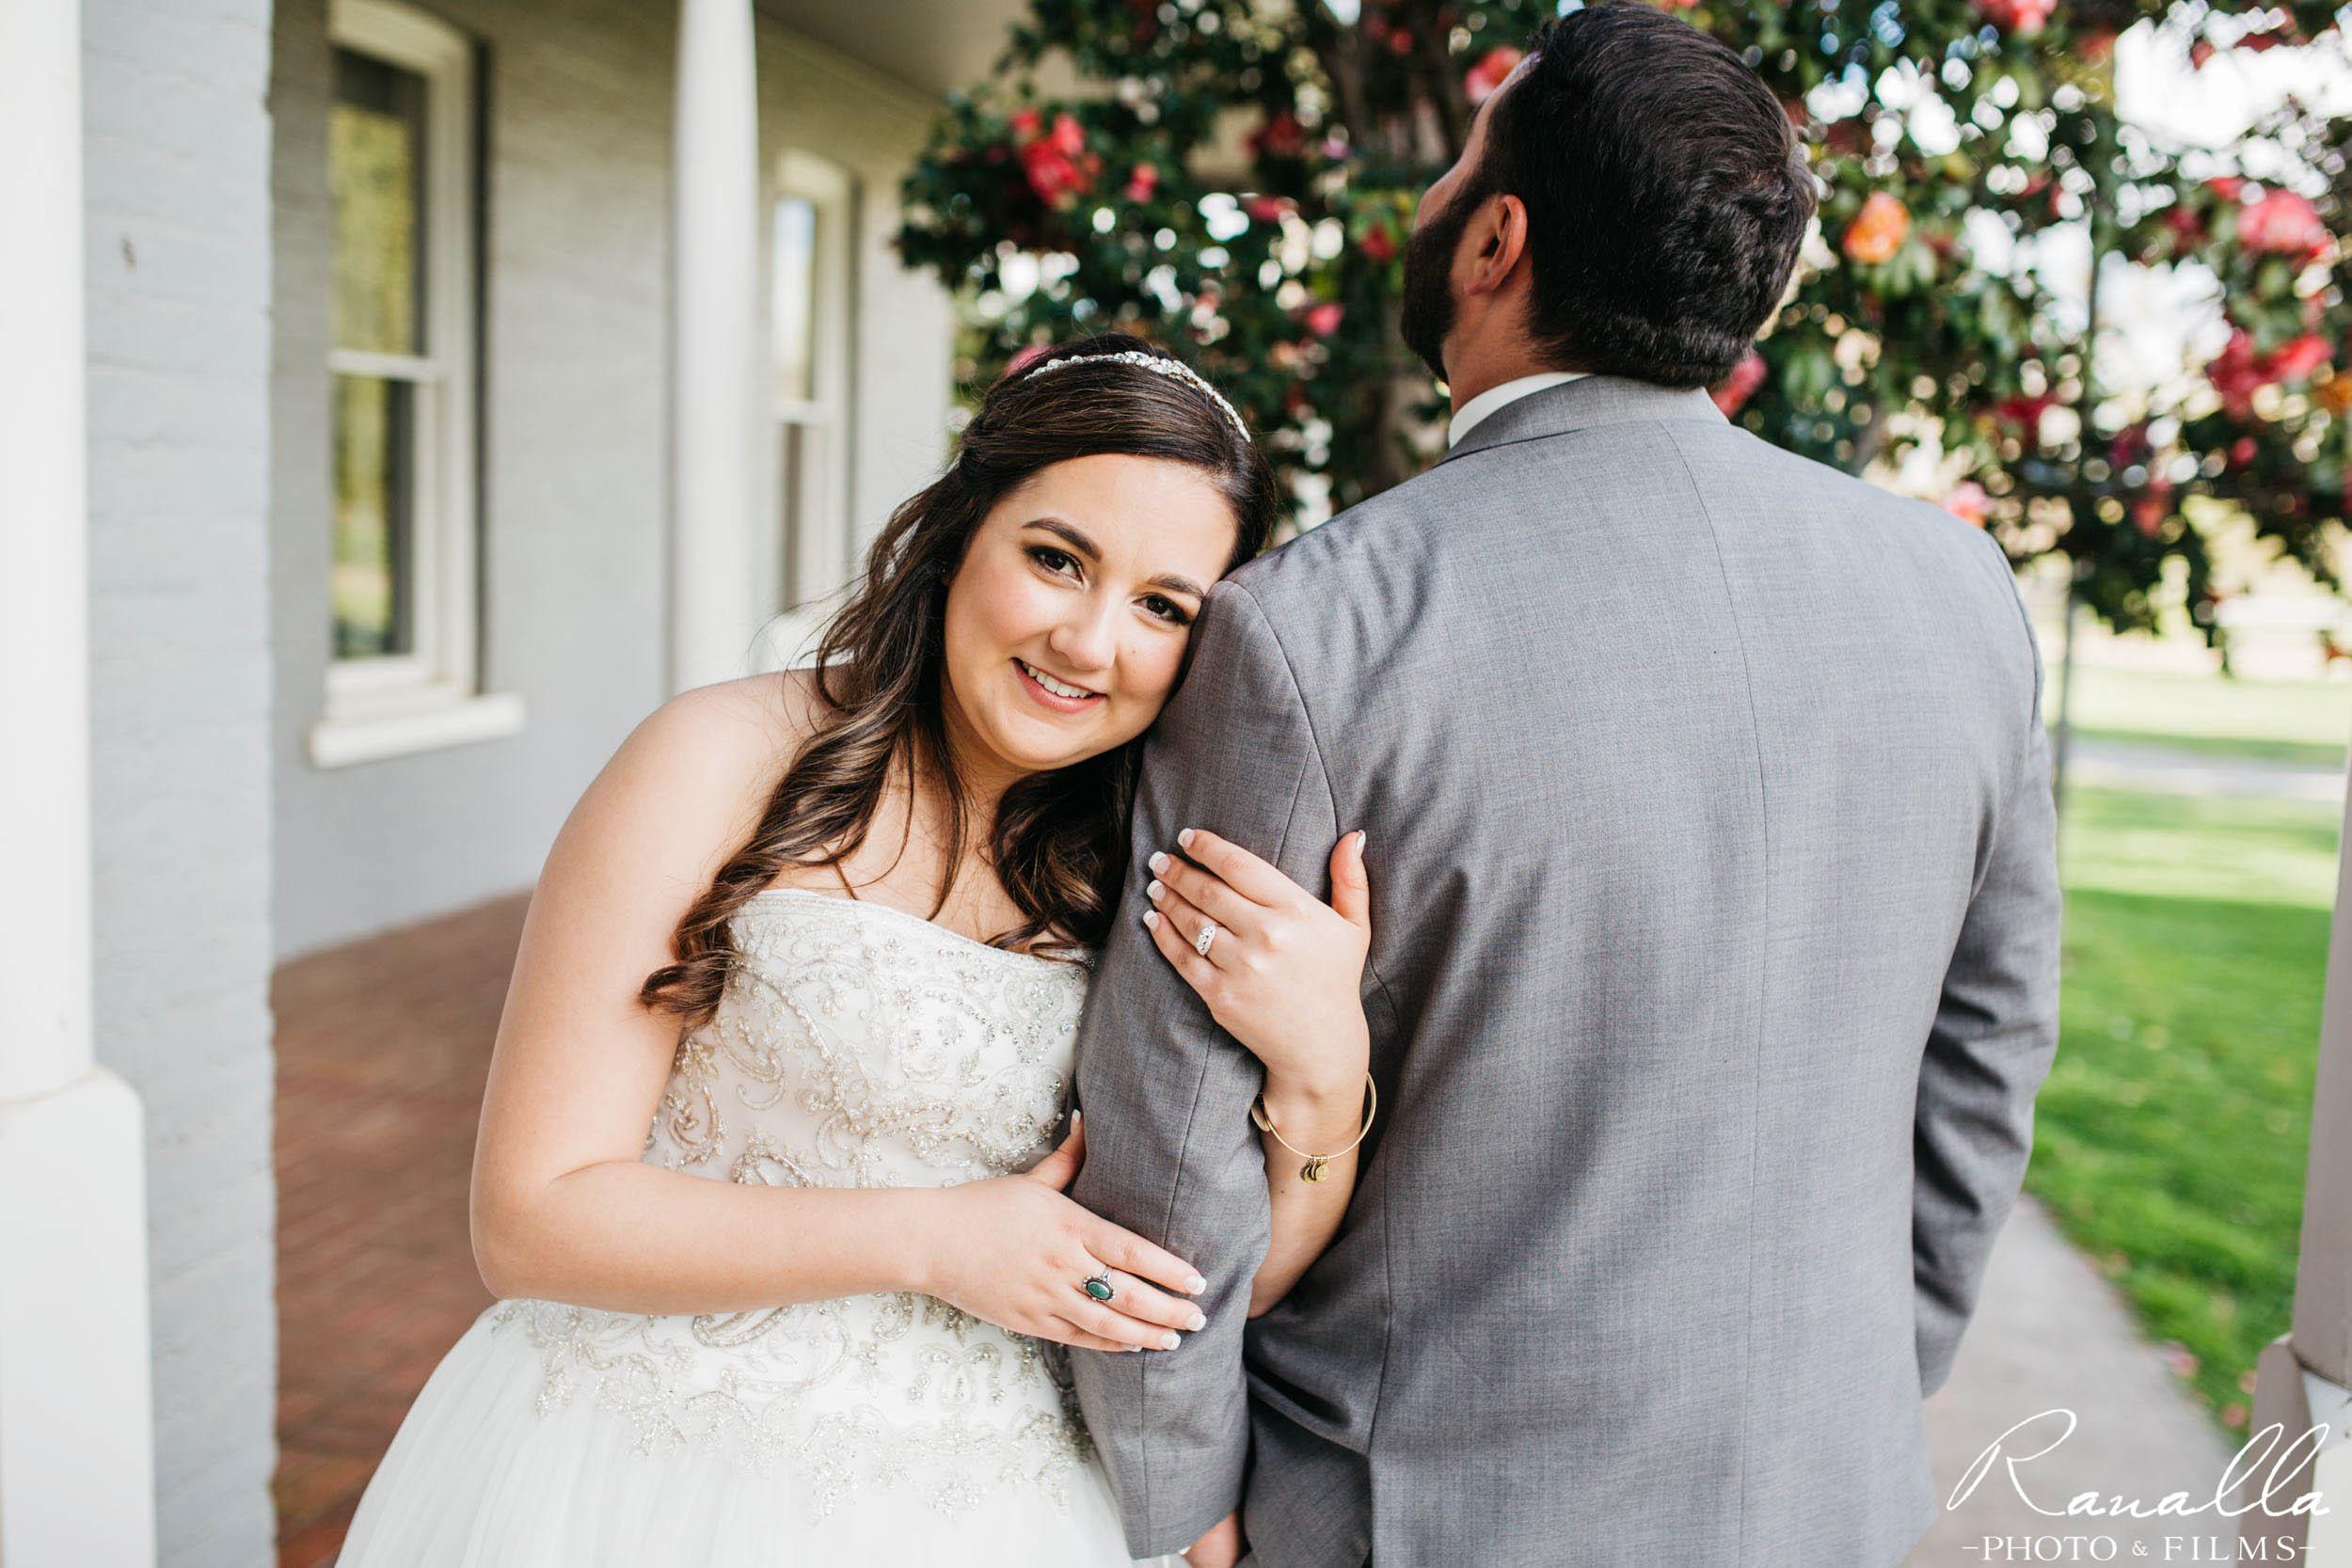 Chico Wedding Photography- Bride Holding Groom's Arm- Patrick Ranch Wedding Photos- Ranalla Photo & Films